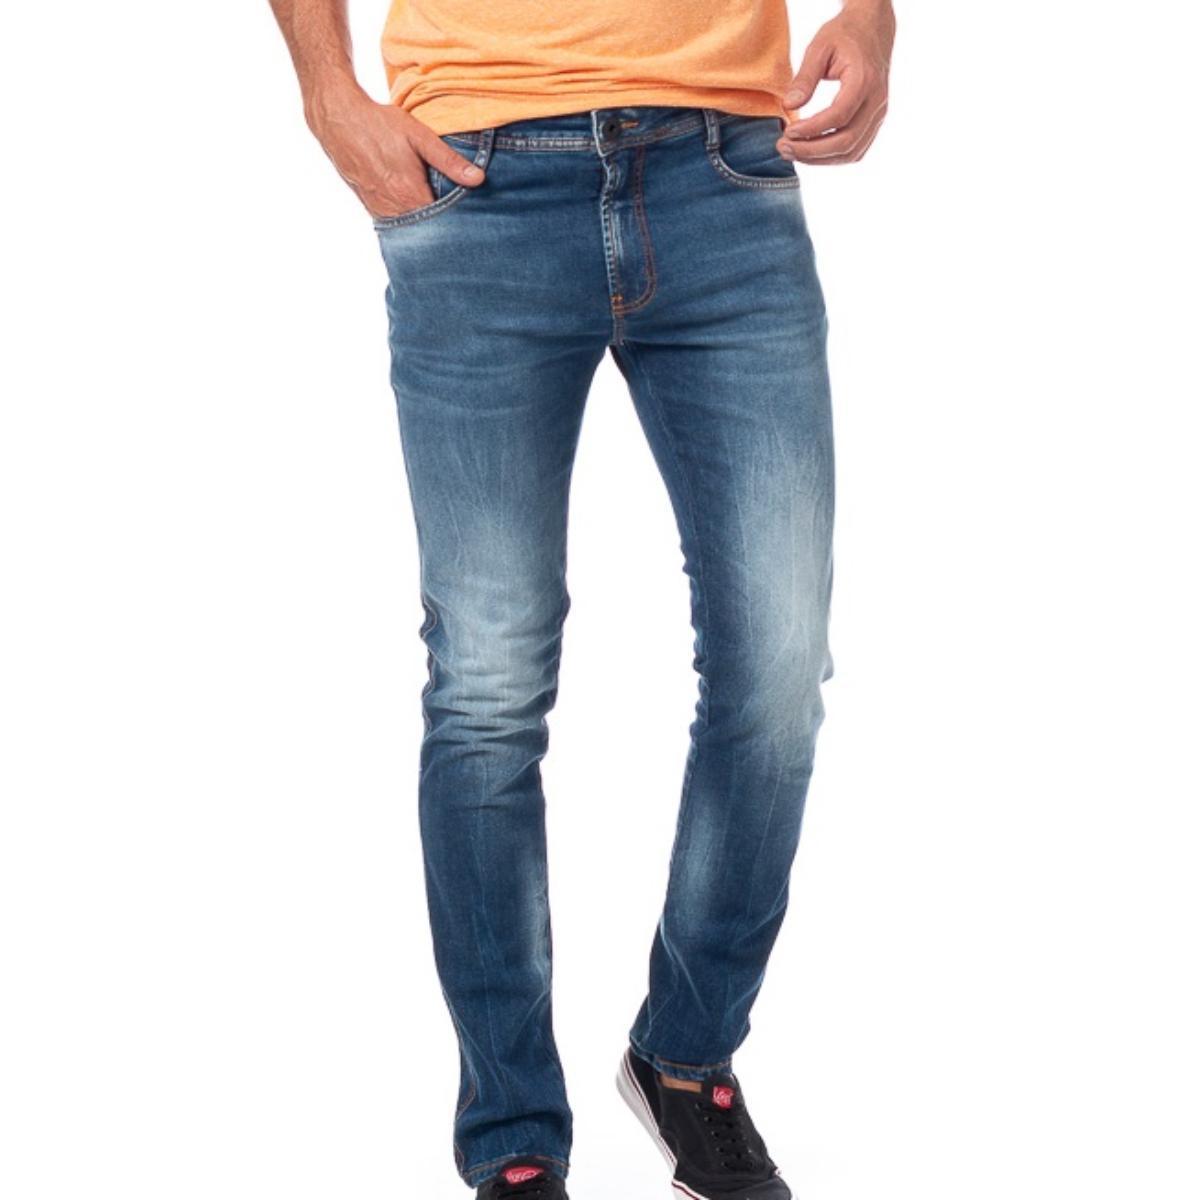 Calça Masculina Coca-cola Clothing 13202576 600 Jeans